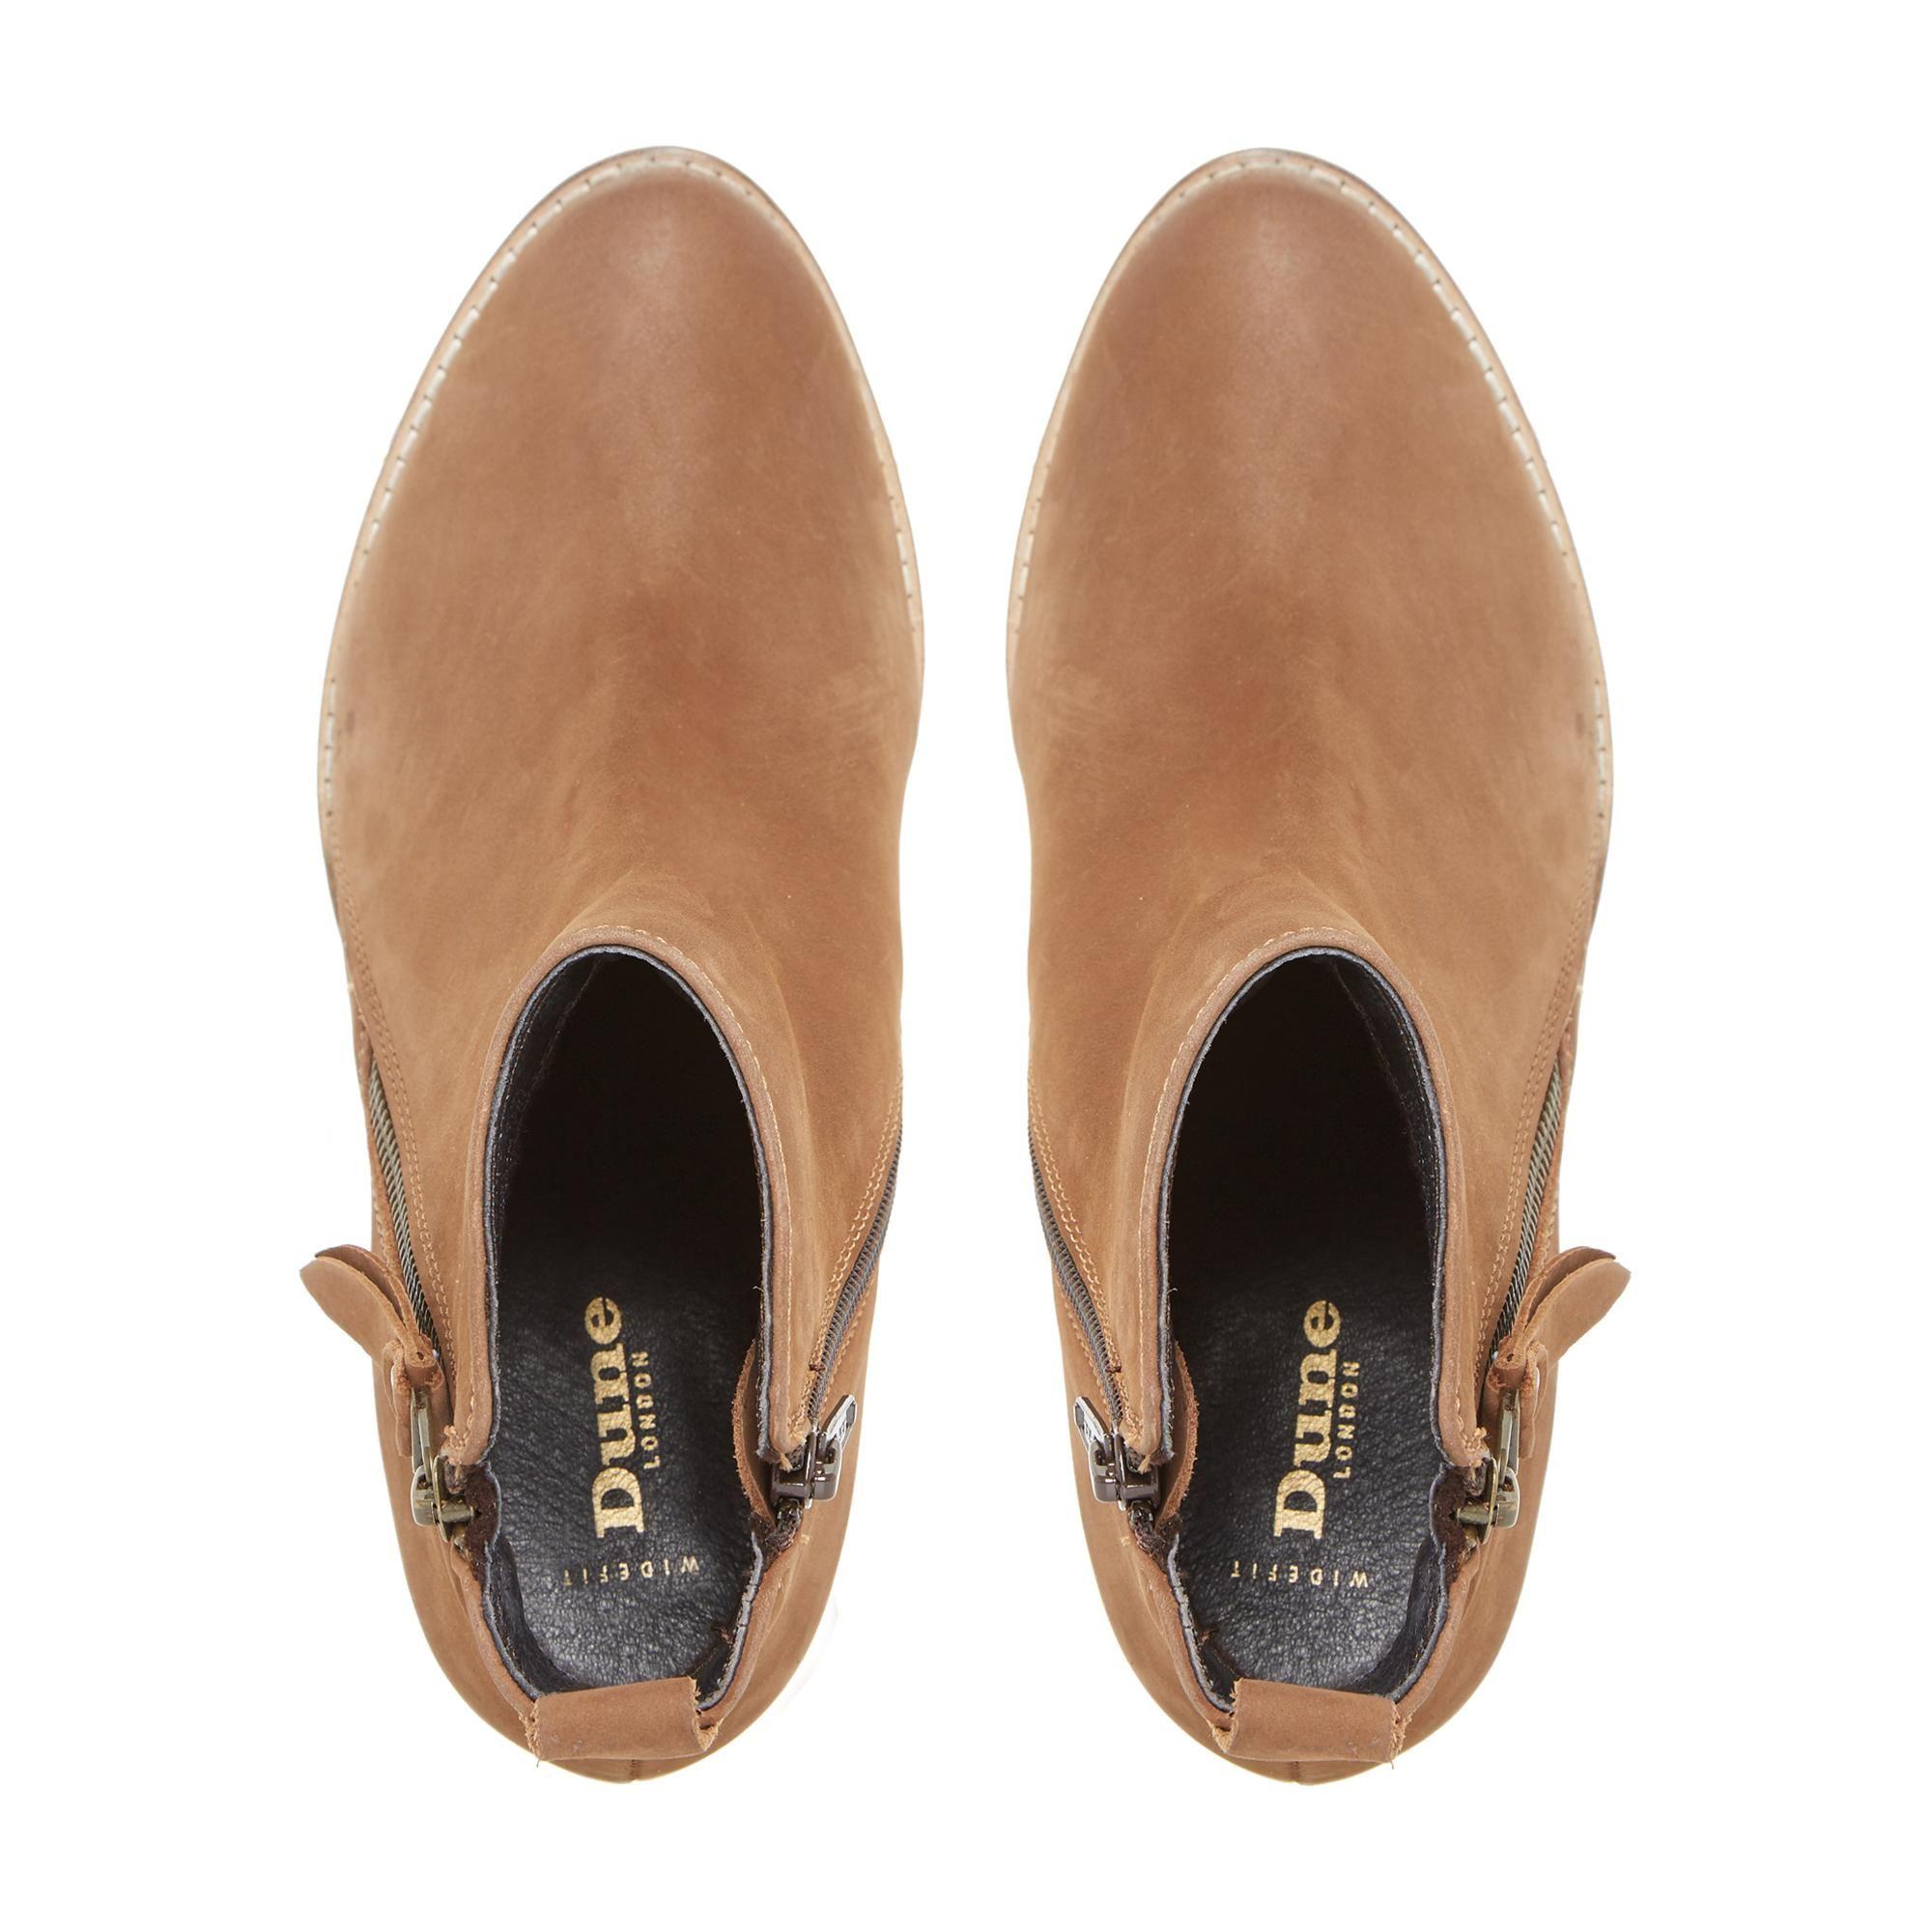 Dune Ladies WF PONTOON Wide Fit Stacked Heel Side Zip Ankle Boots